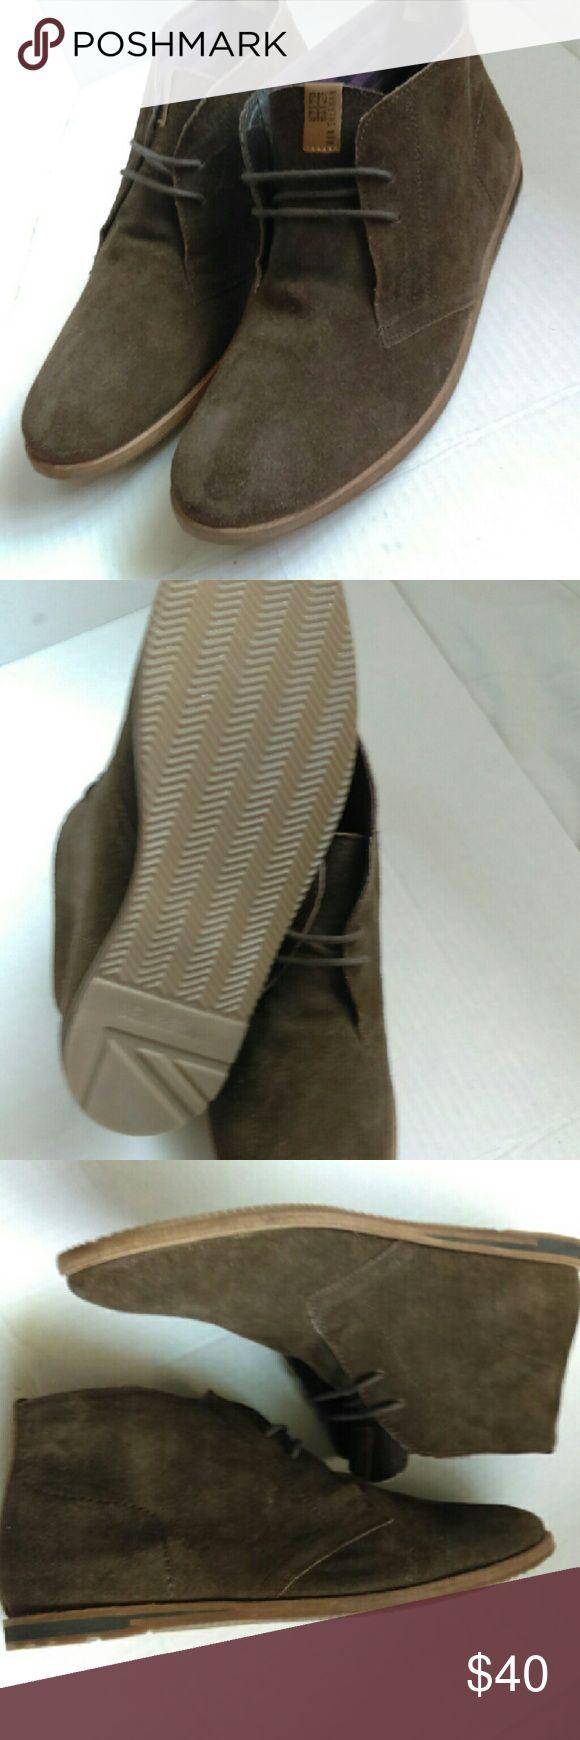 Ben Sherman suede chukka boots Men's size 11.5 suede Chukka Boots. Ben Sherman brand and in brand new condition. Ben Sherman Shoes Chukka Boots